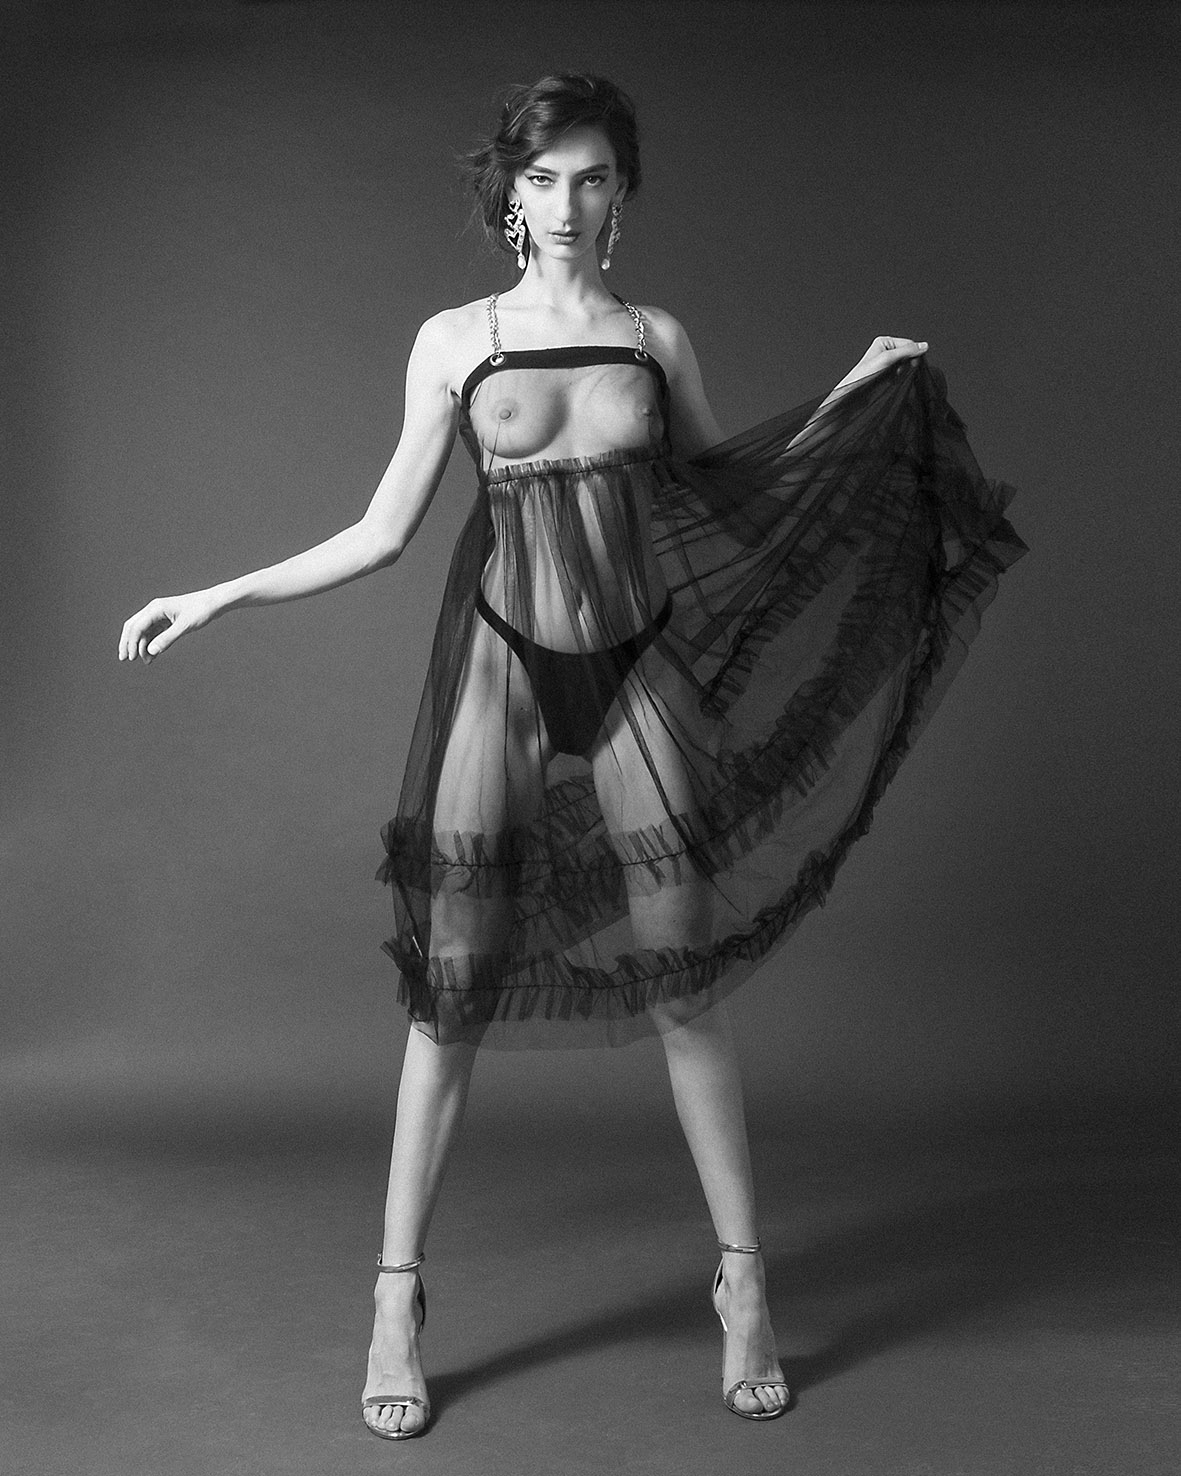 Categorie: Boudoir & Nude, Fine Art, Glamour; Photographer: LEONE RECH DALDOSSO; Art Director: PAOLA PECORARI; Musa: PIA PILLA; Location: Brescia, BS, Italia